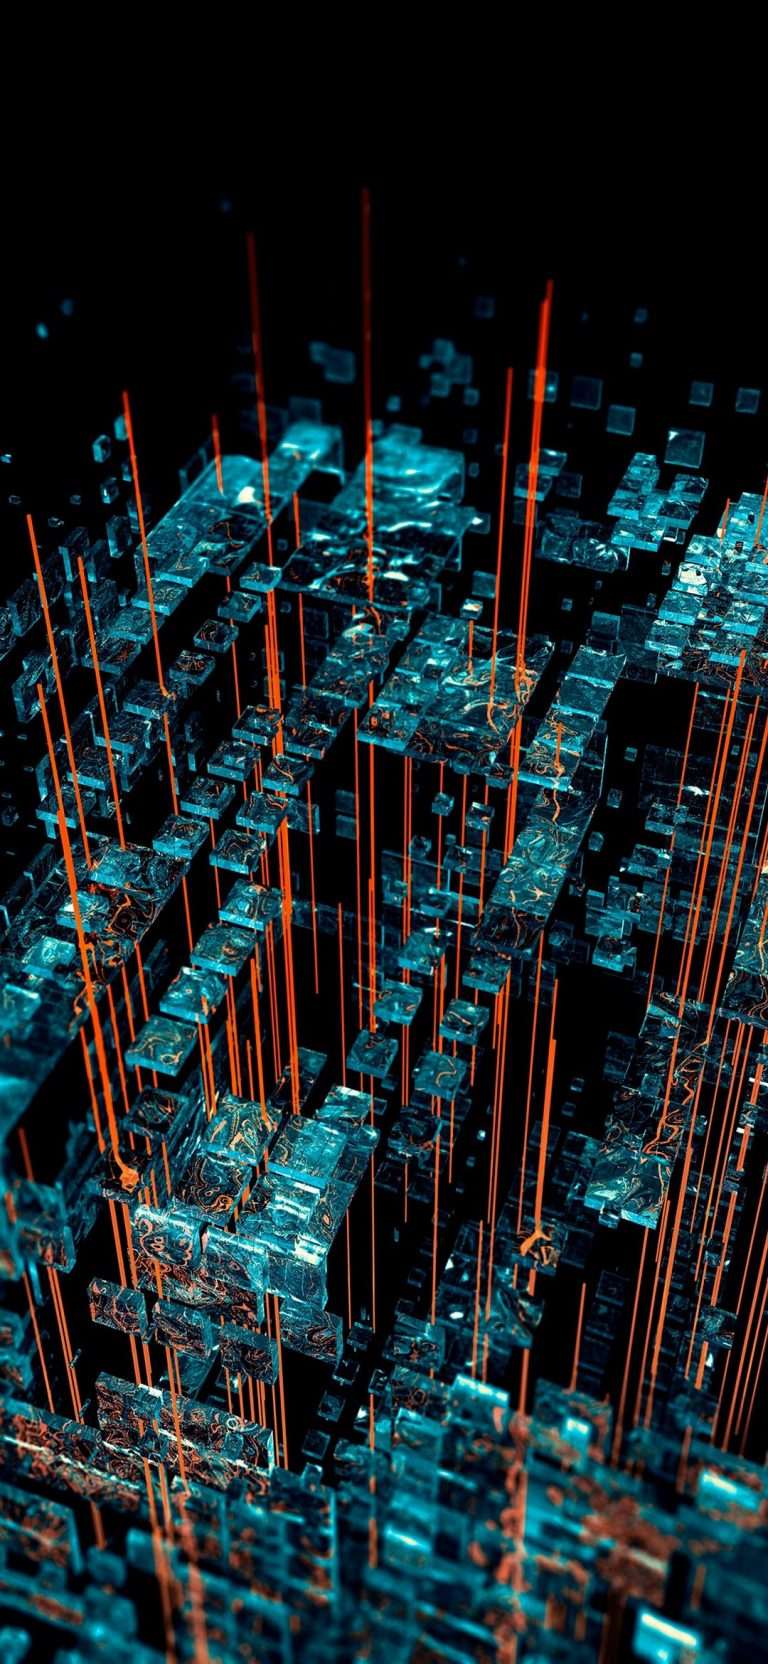 3D Phone Wallpaper 015 1080x2340 768x1664